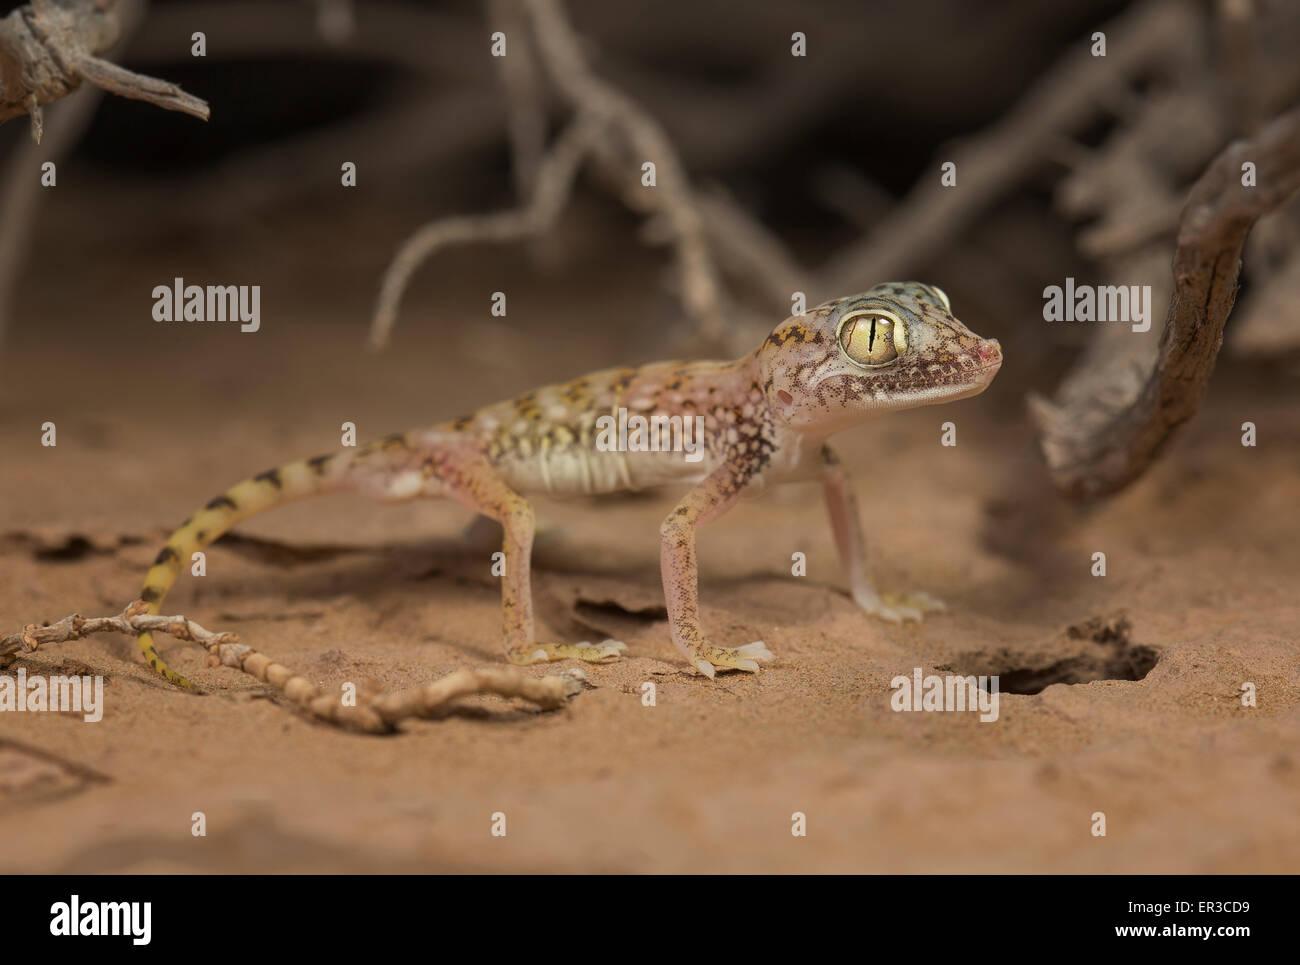 Middle Eastern short-fingered gecko (Stenodactylus doriae), Sharjah, UAE Stock Photo